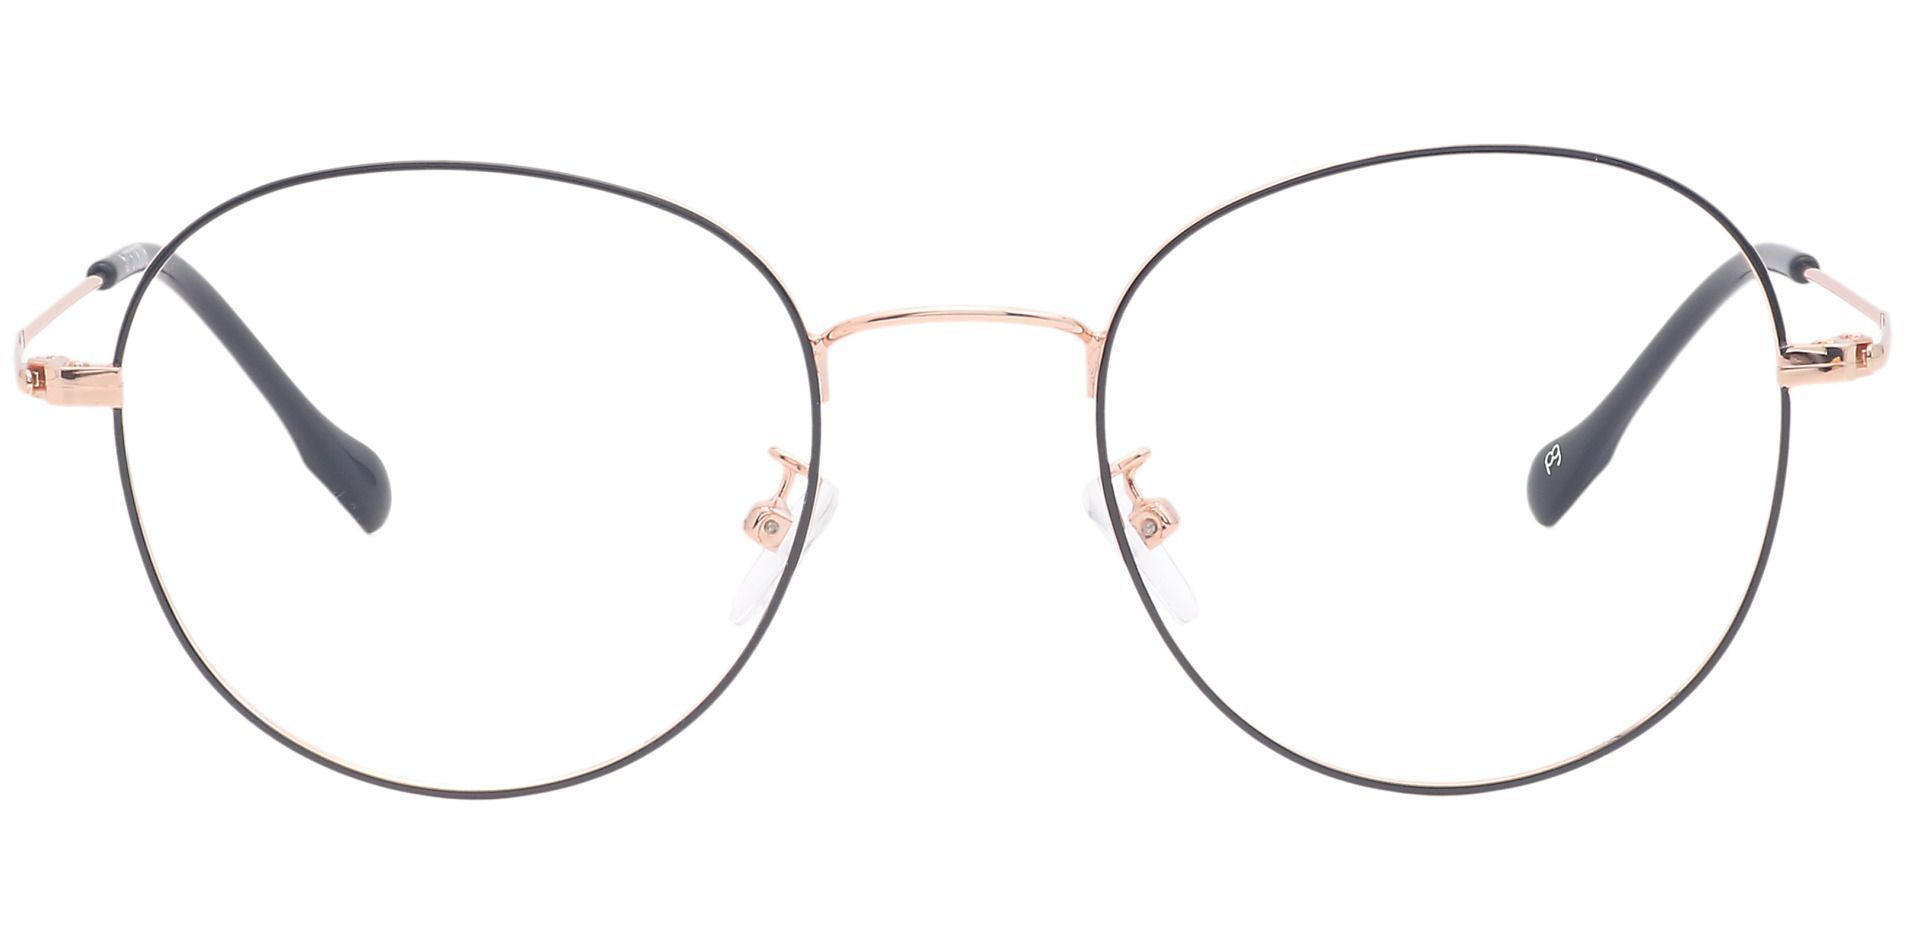 Miller Oval Prescription Glasses - Black